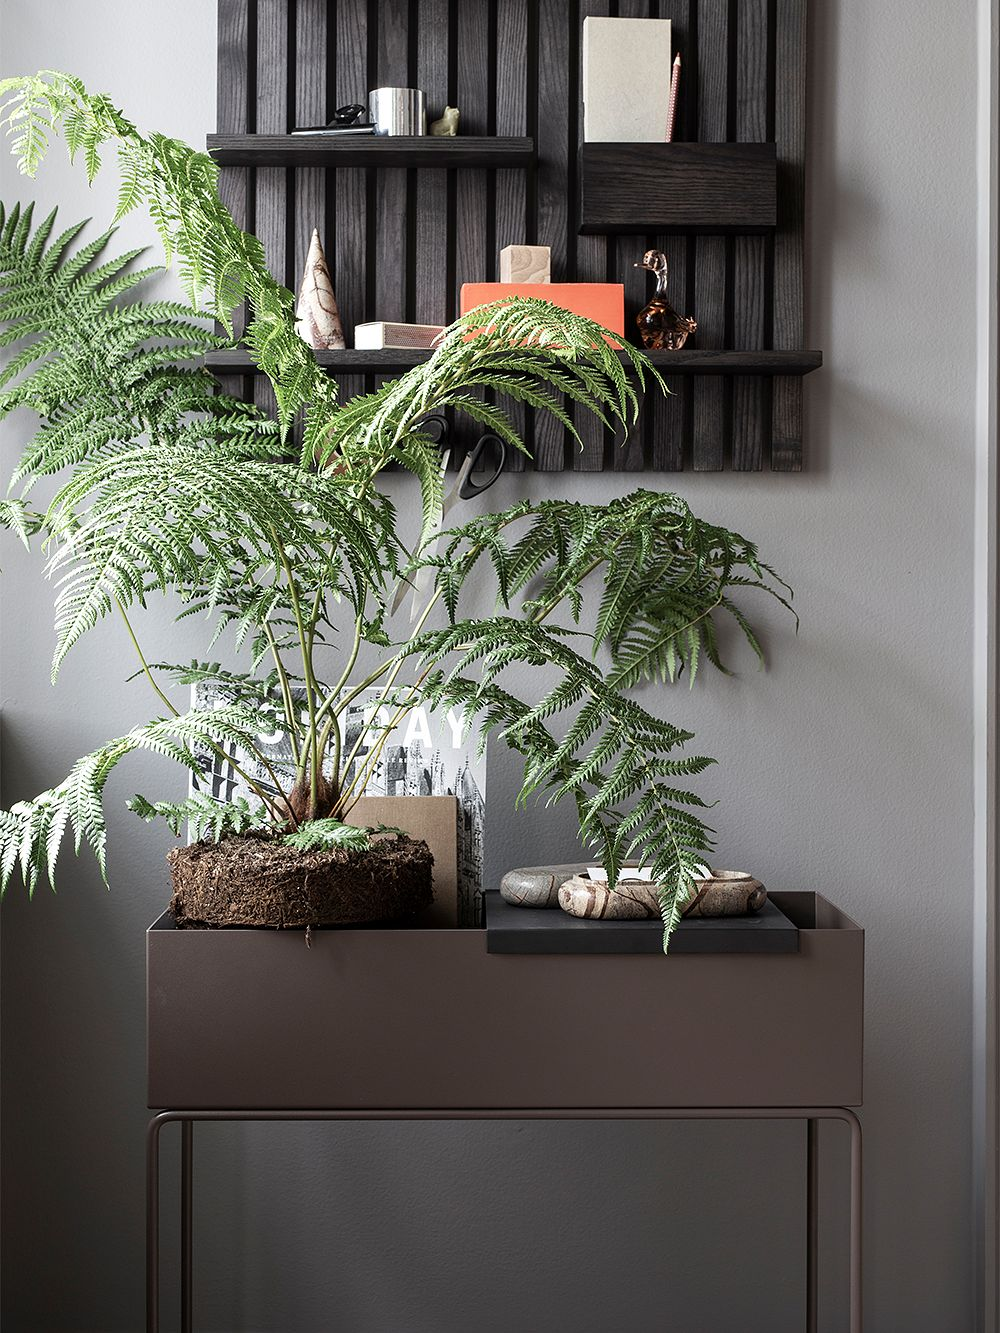 Ferm Livingin Plant Box -kasviteline osana sisustusta.